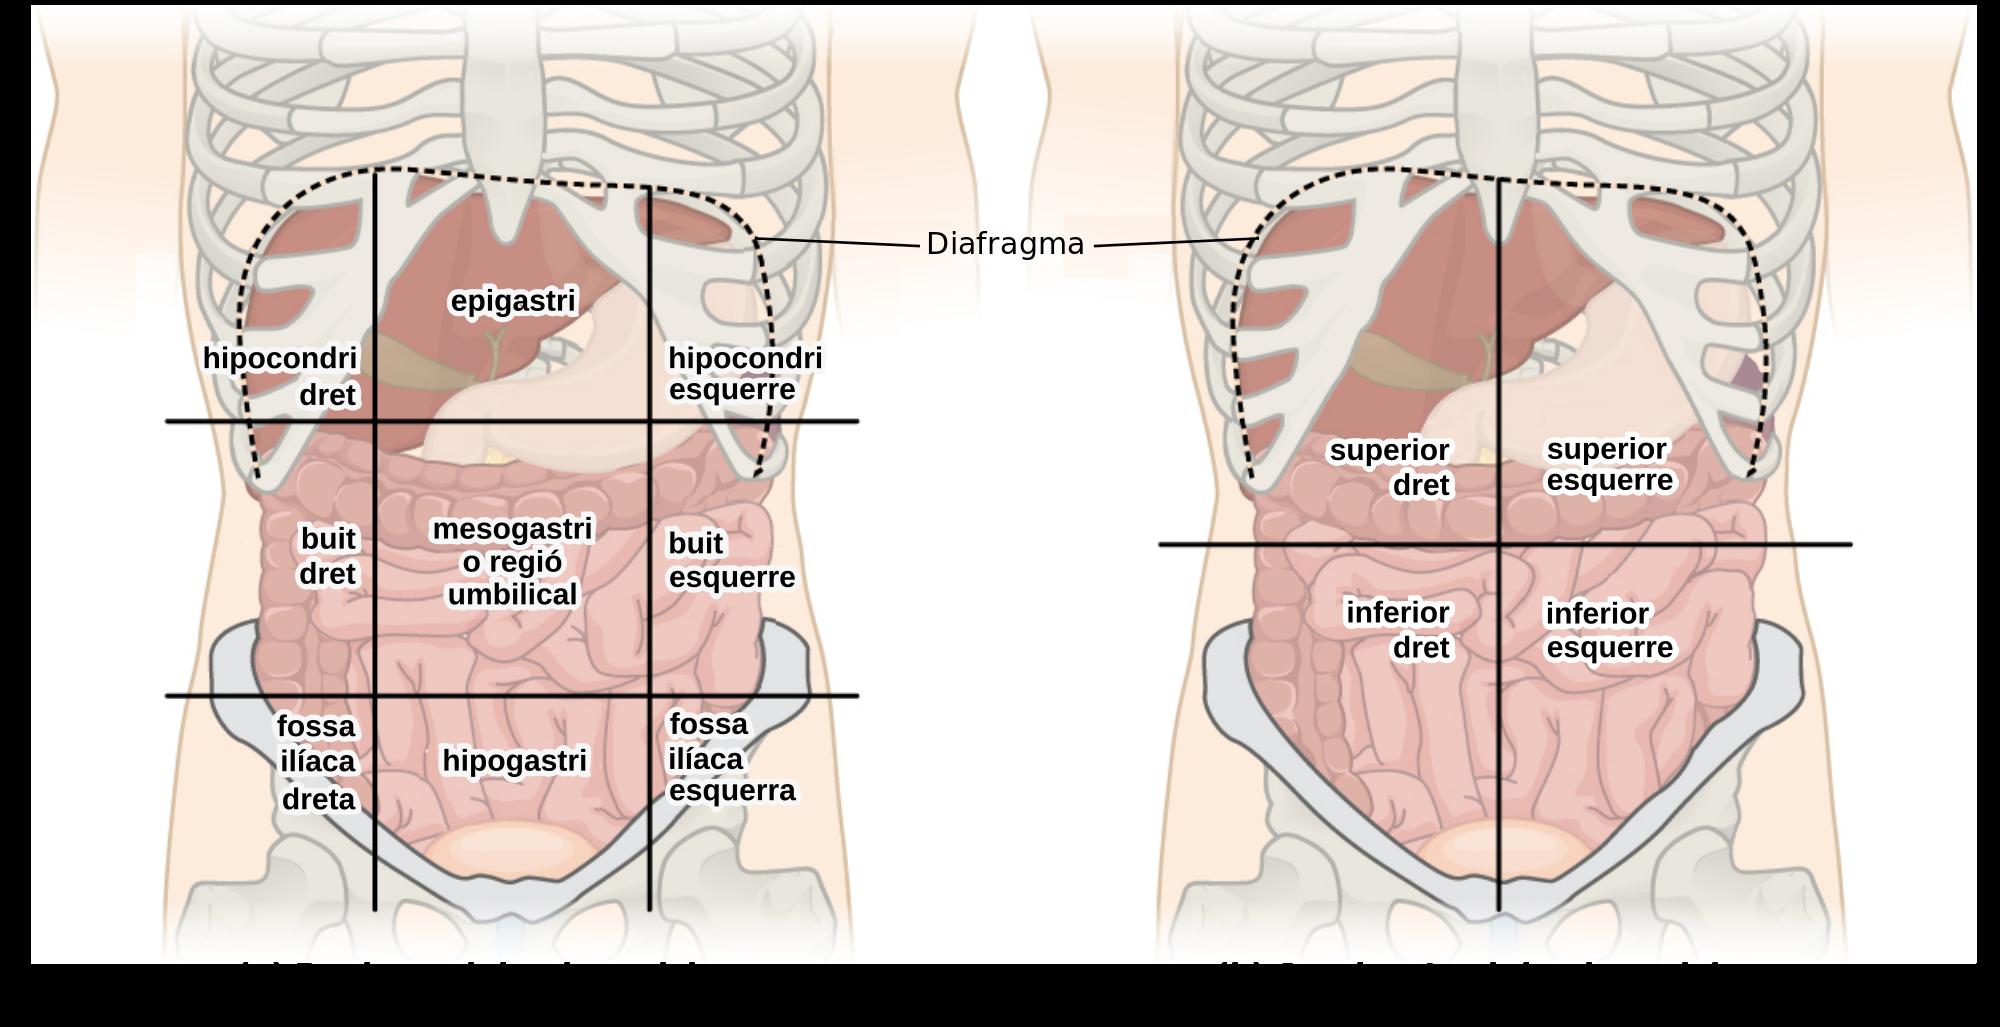 Abdominal Quadrants And Regions Fileabdominal Quadrant